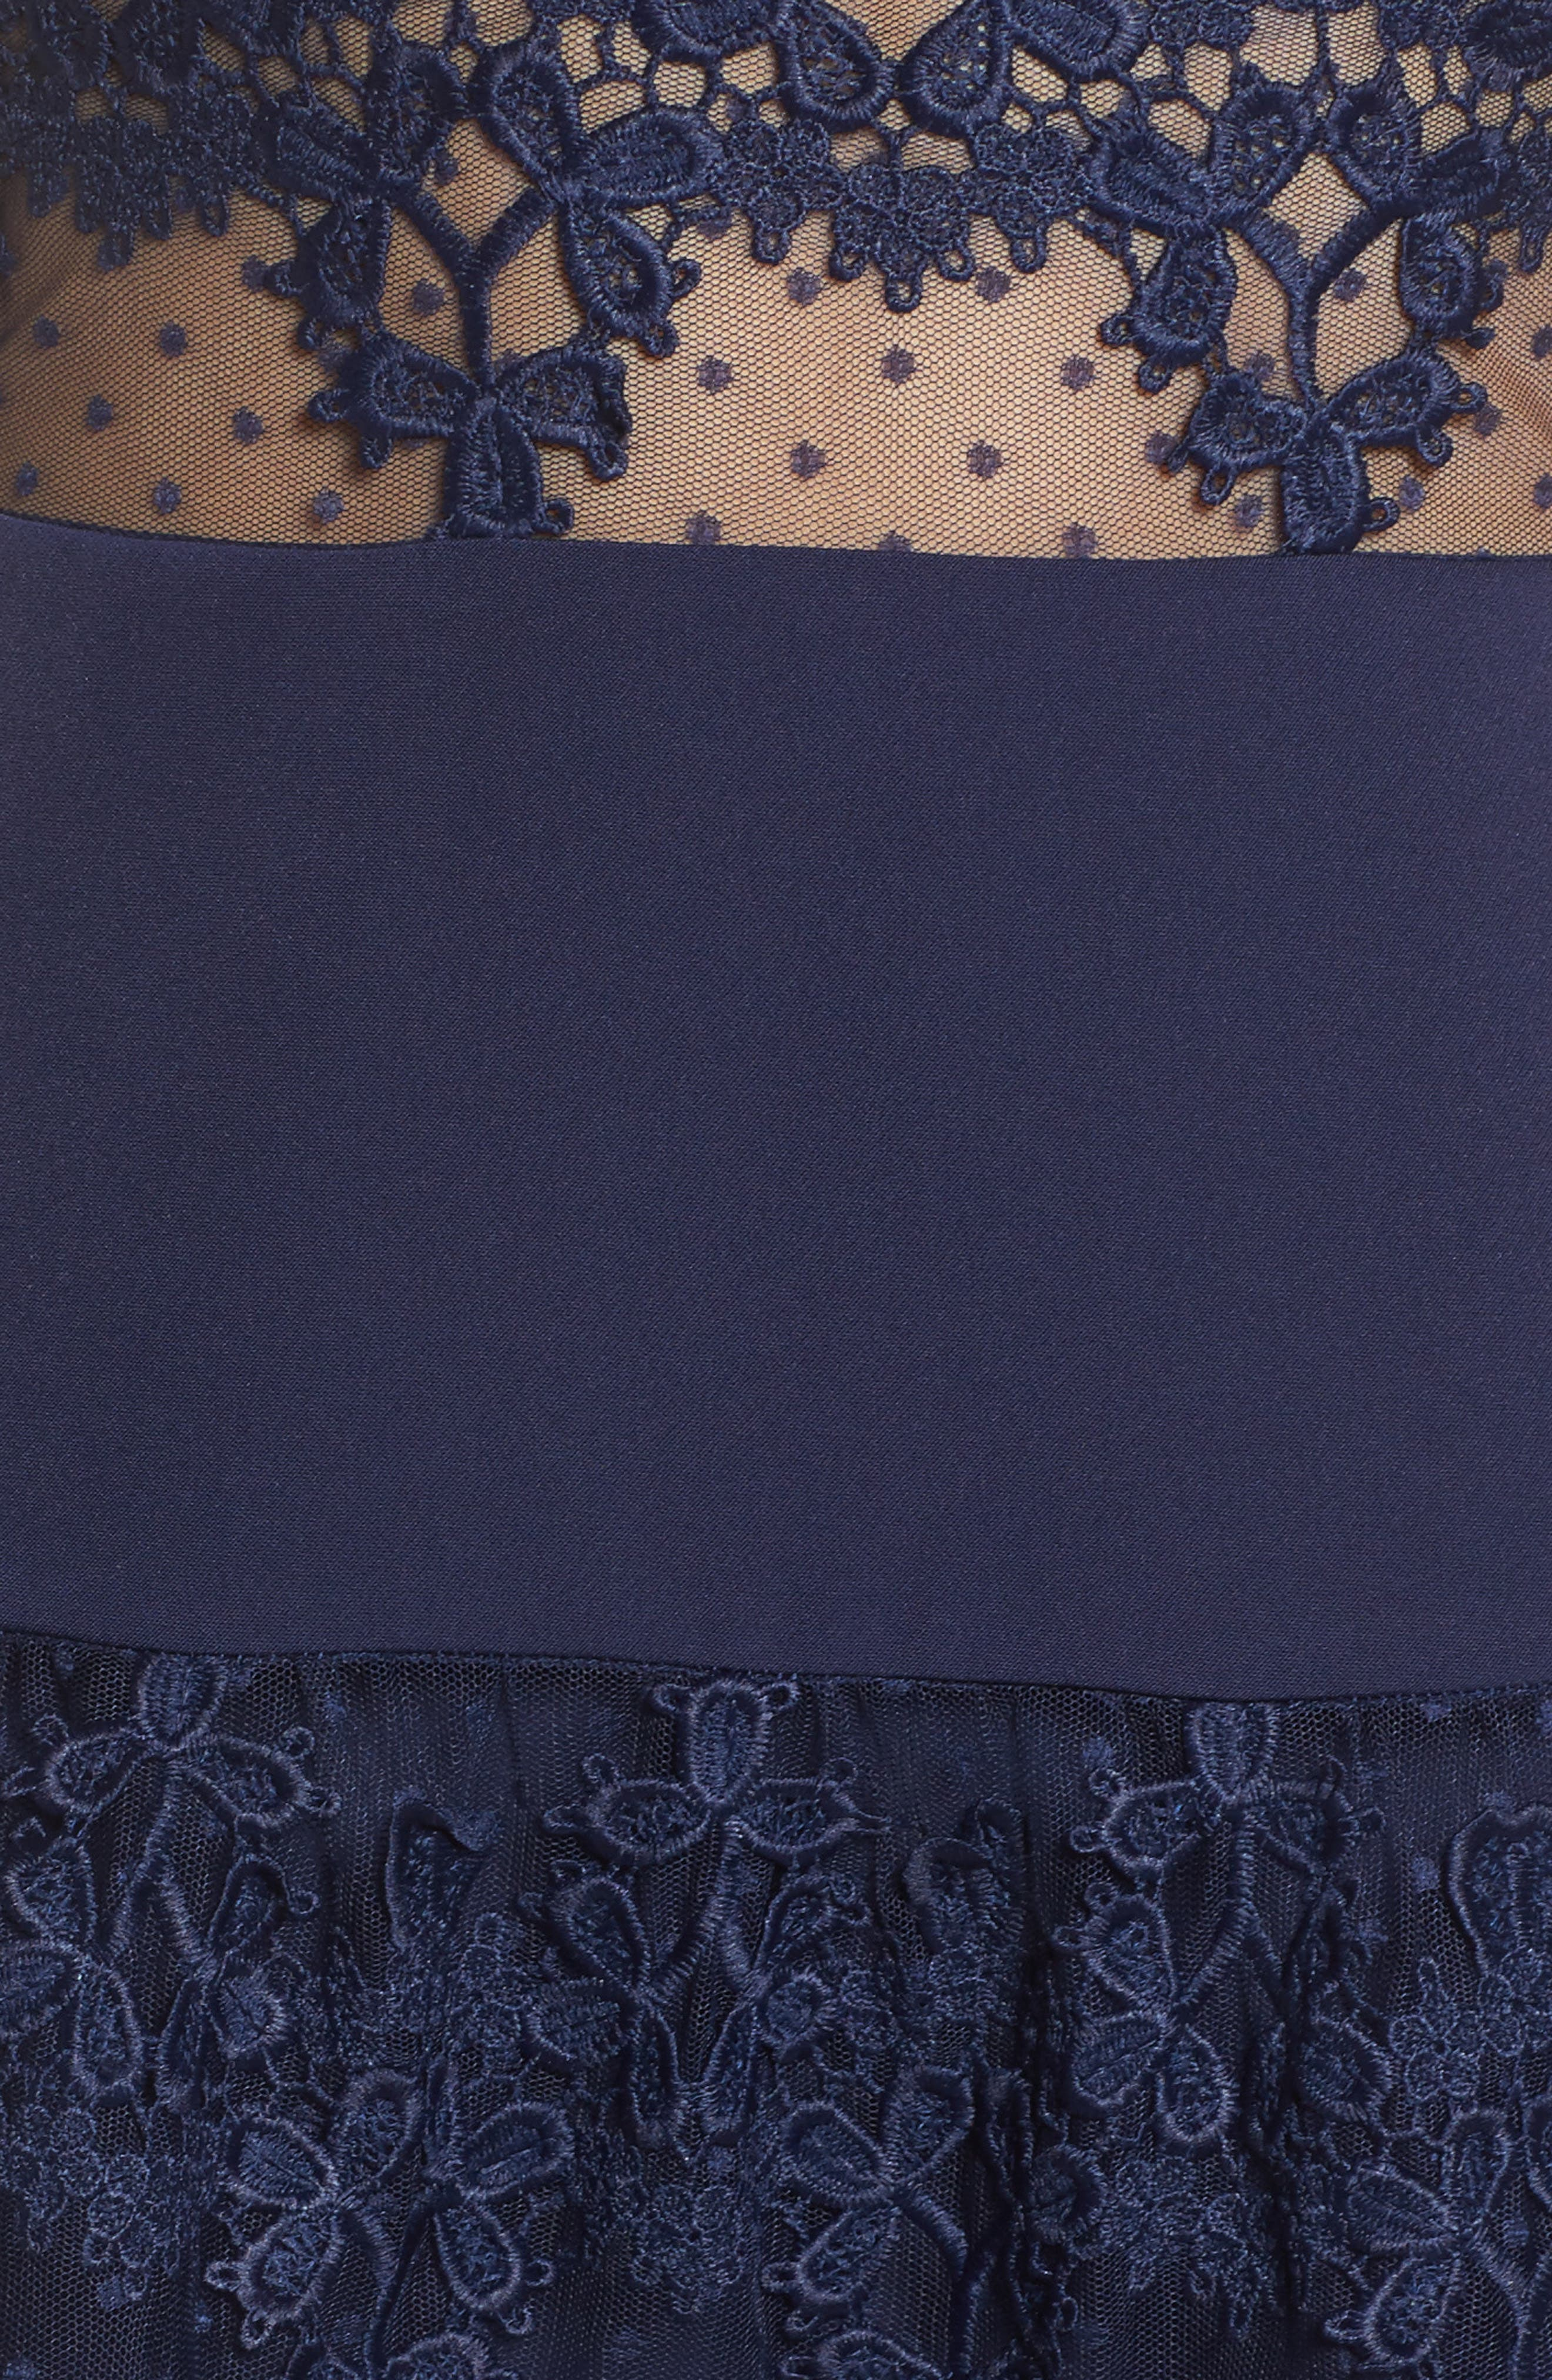 Flamenco Lace Inset Fit & Flare Dress,                             Alternate thumbnail 5, color,                             410